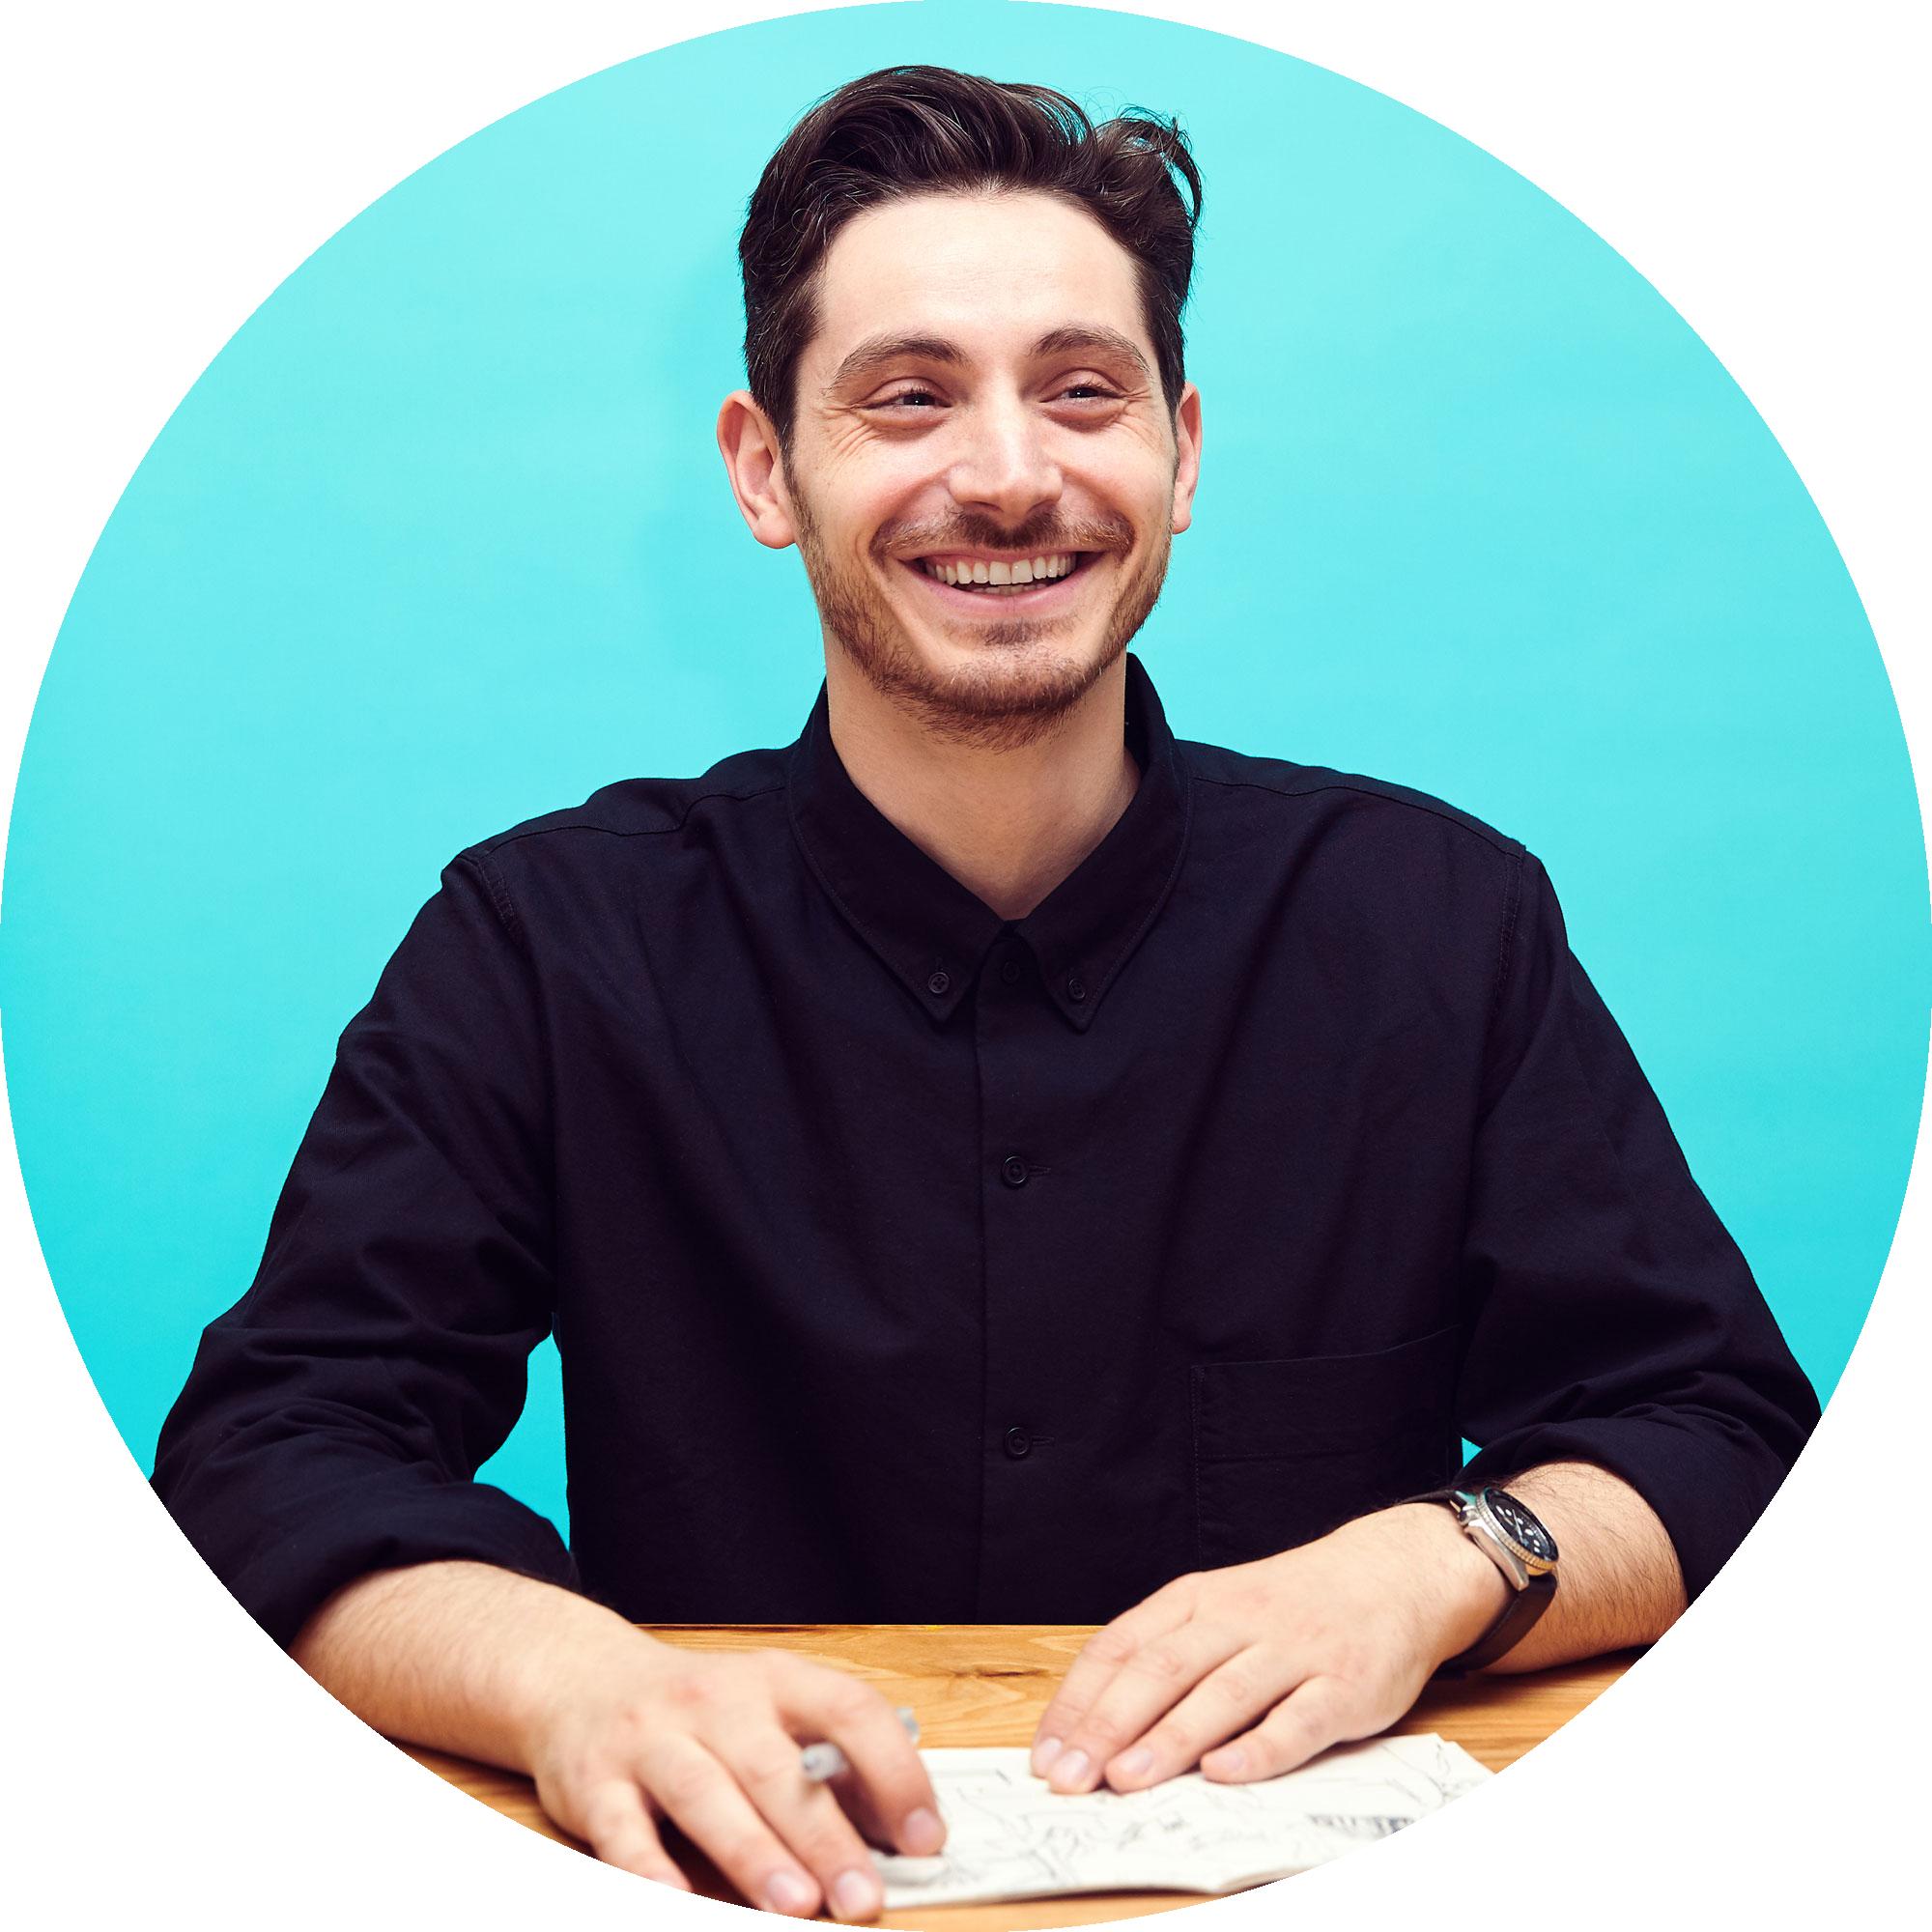 Daniel Salmieri